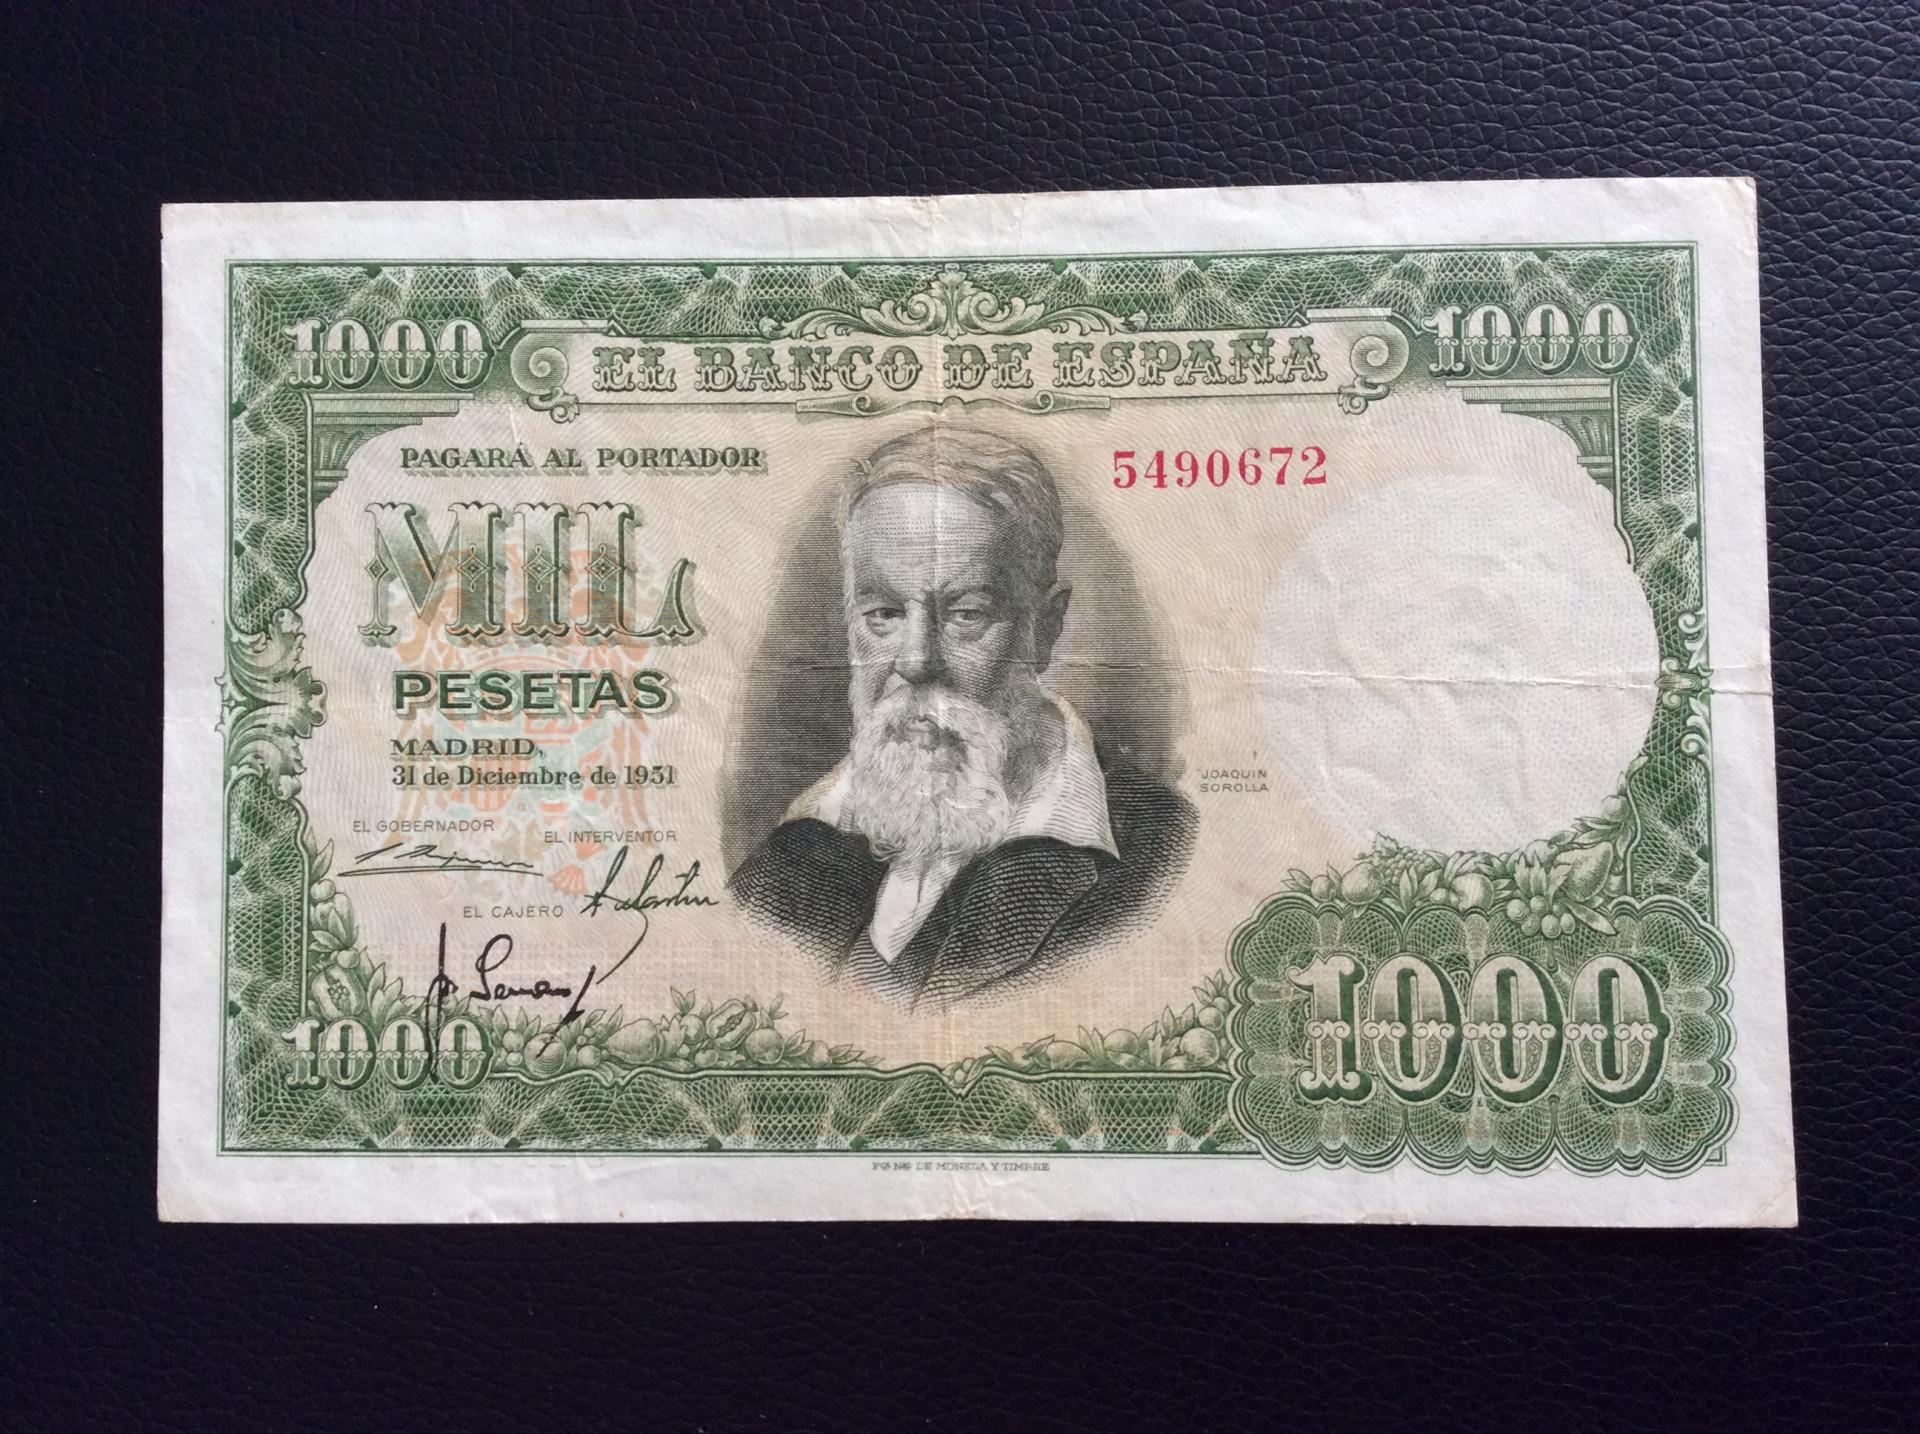 1000 PESETAS 1951 - SIN SERIE -  SOROLLA